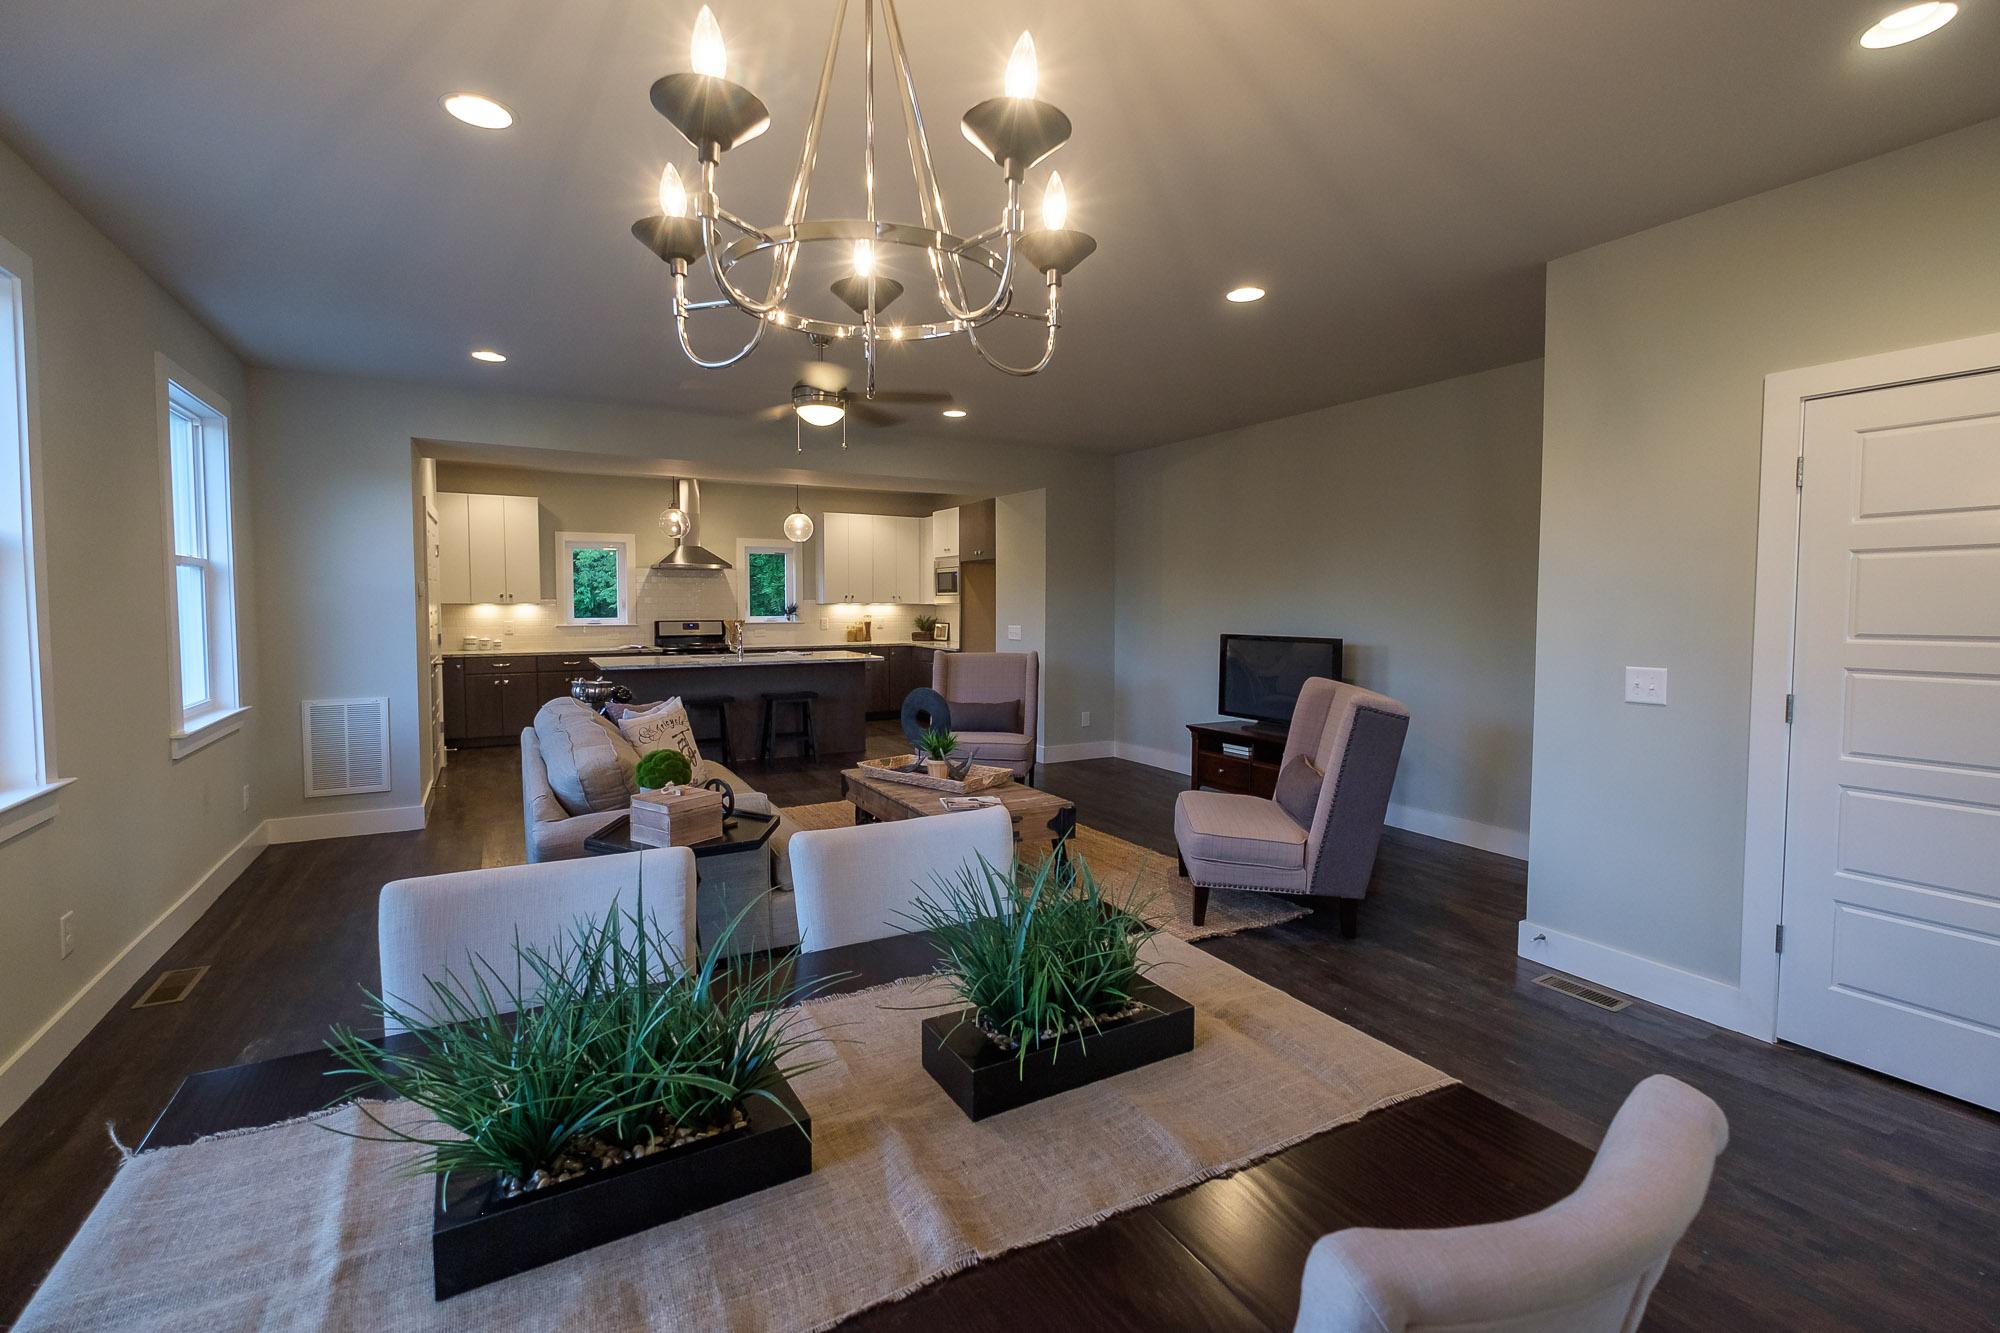 House-Plans-Online-Duplex-Nashville-Peggy-Newman-Living-Kitchen-Great Room-Porter.jpg